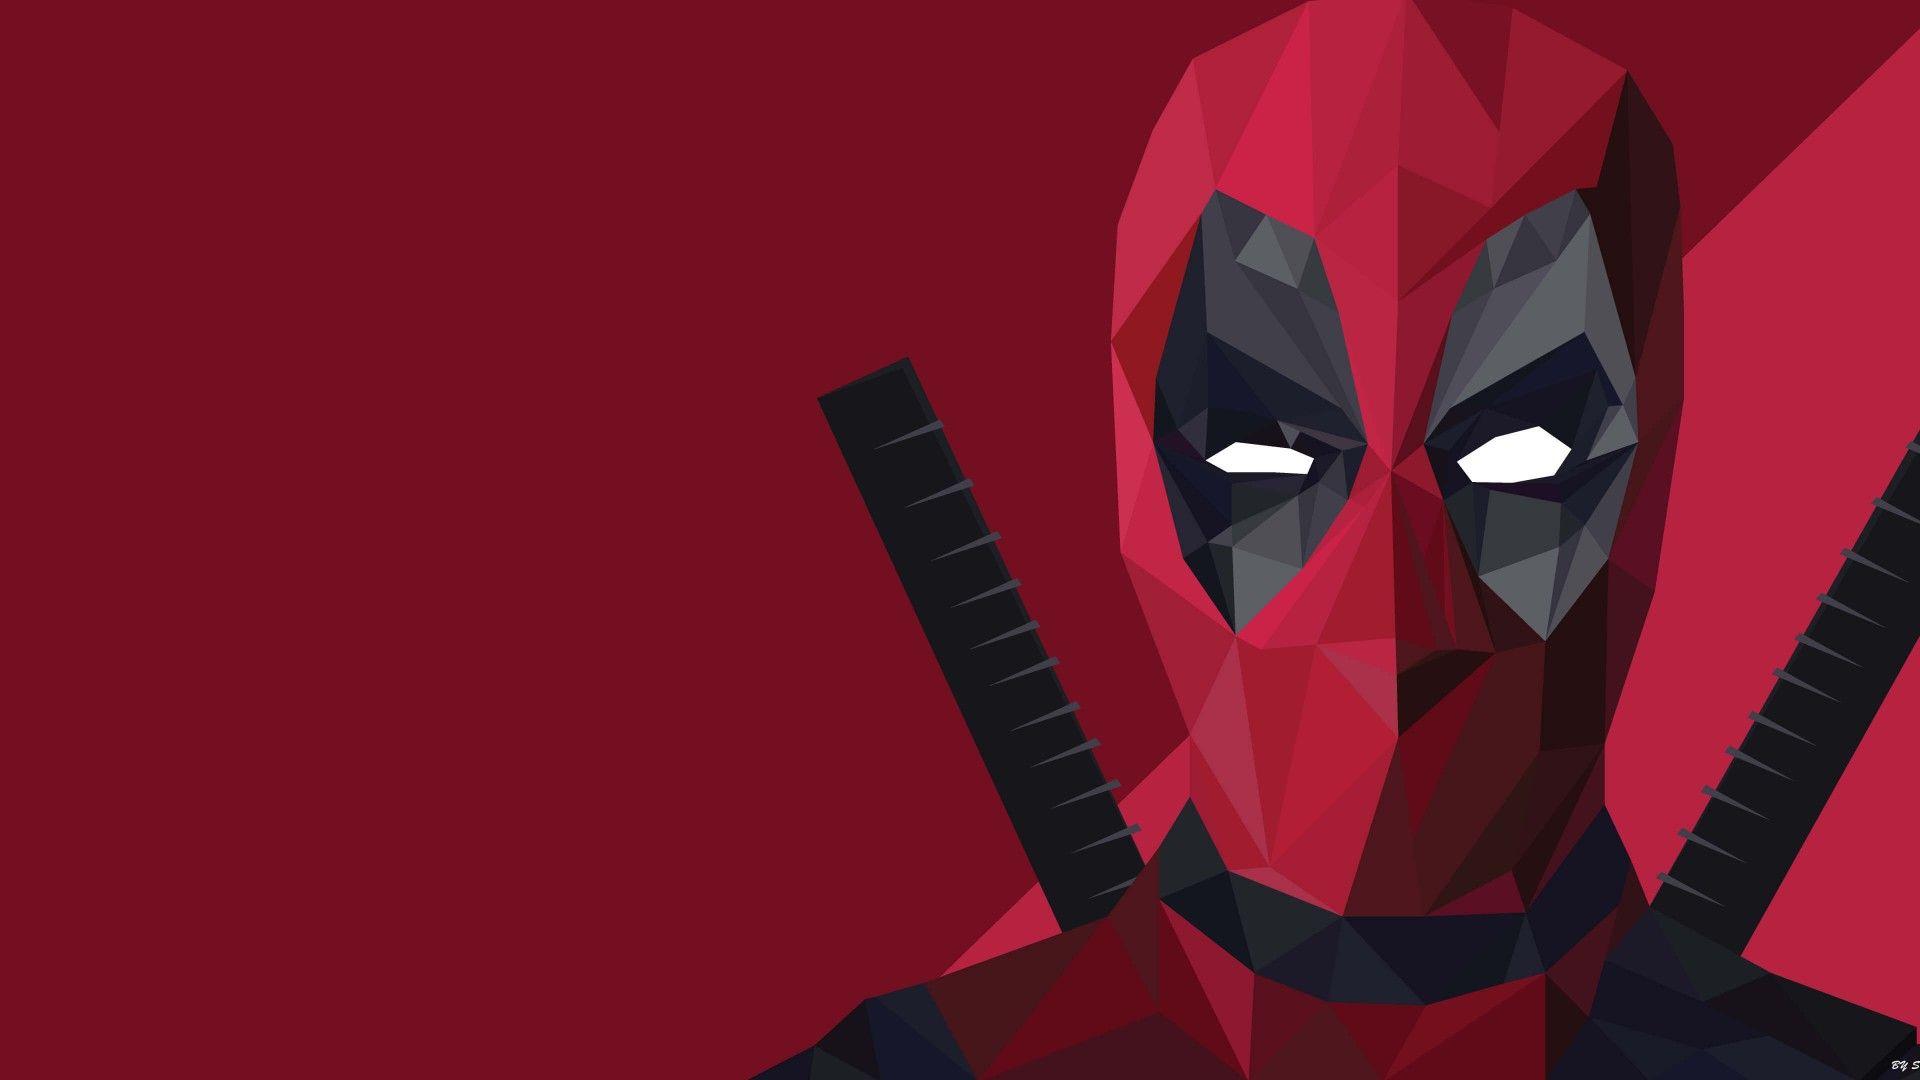 Deadpool Deadpool Deadpool Hd Wallpaper Marvel